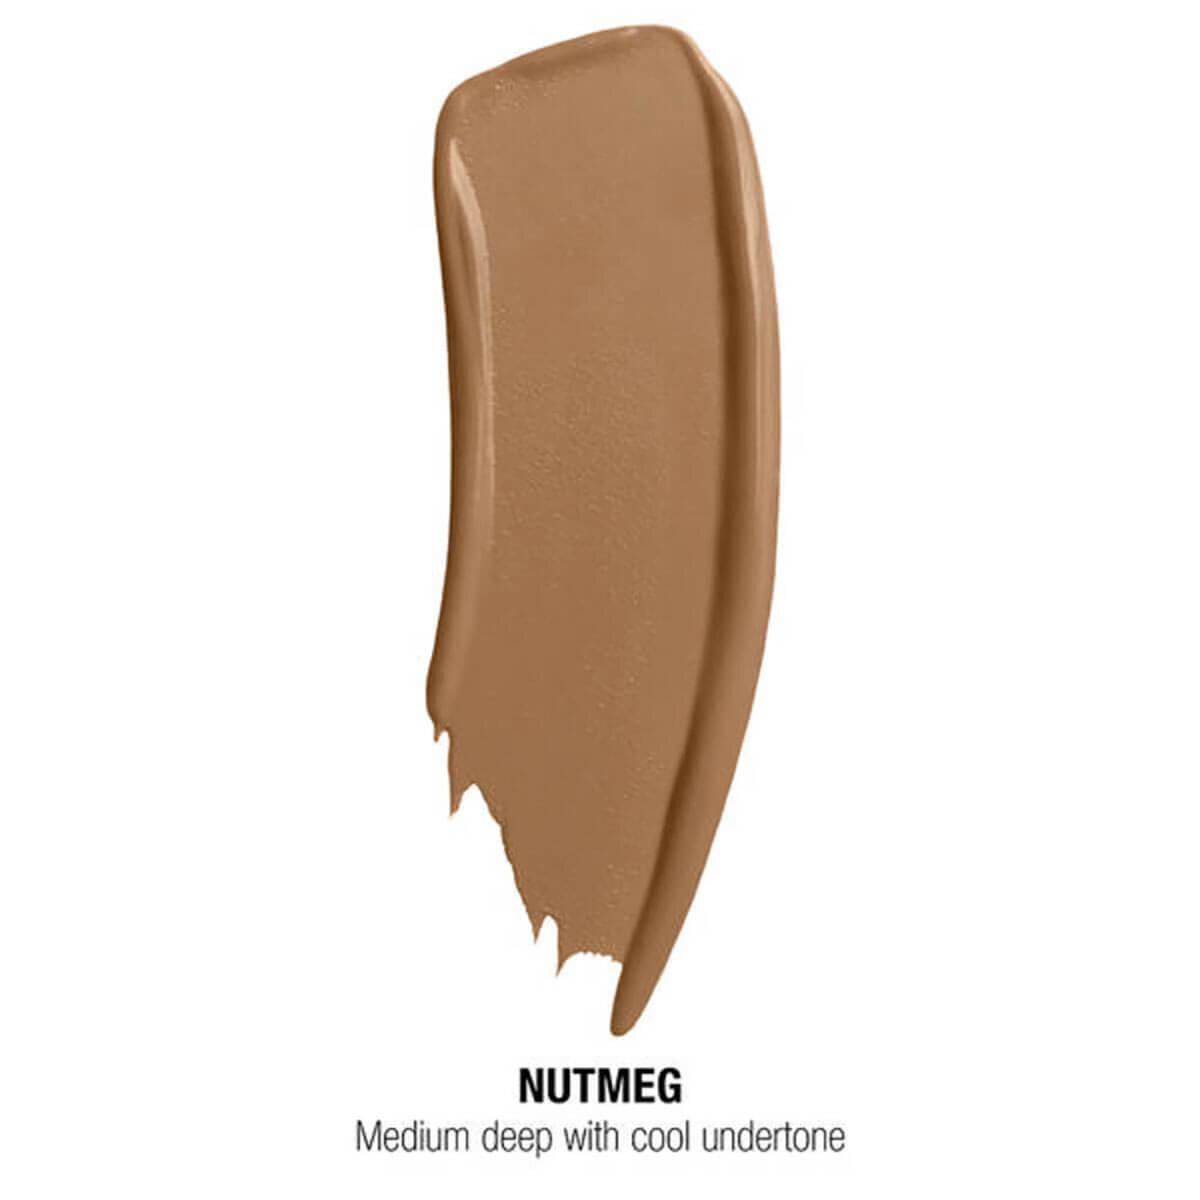 Can't Stop Won't Stop 24 Hour Fondöten -Nutmeg